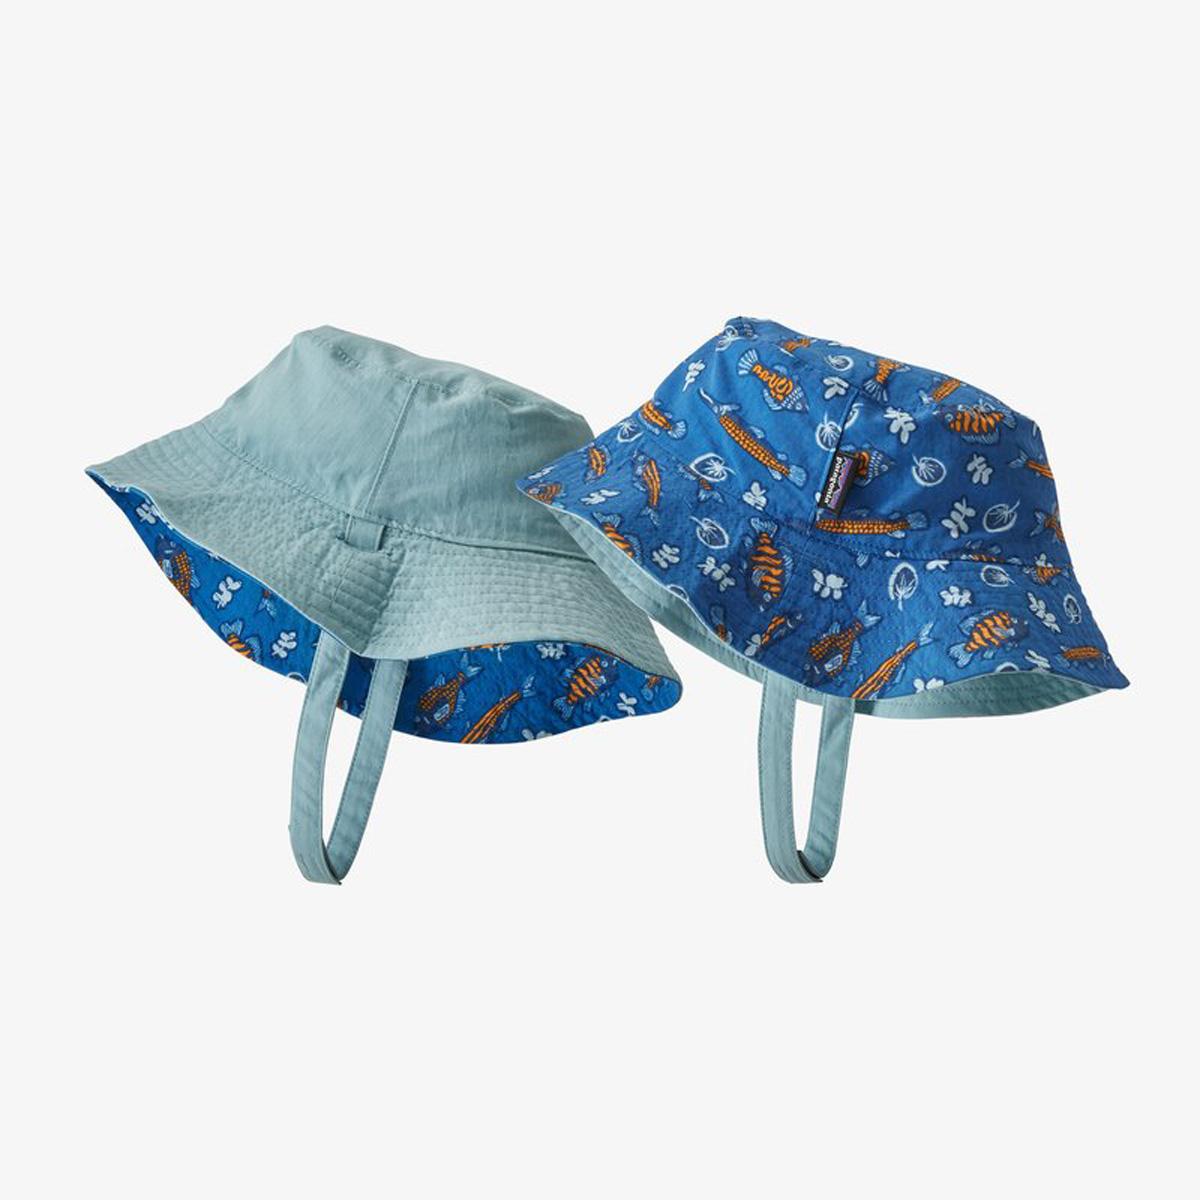 Patagonia Baby Sun Bucket Hat (66076)